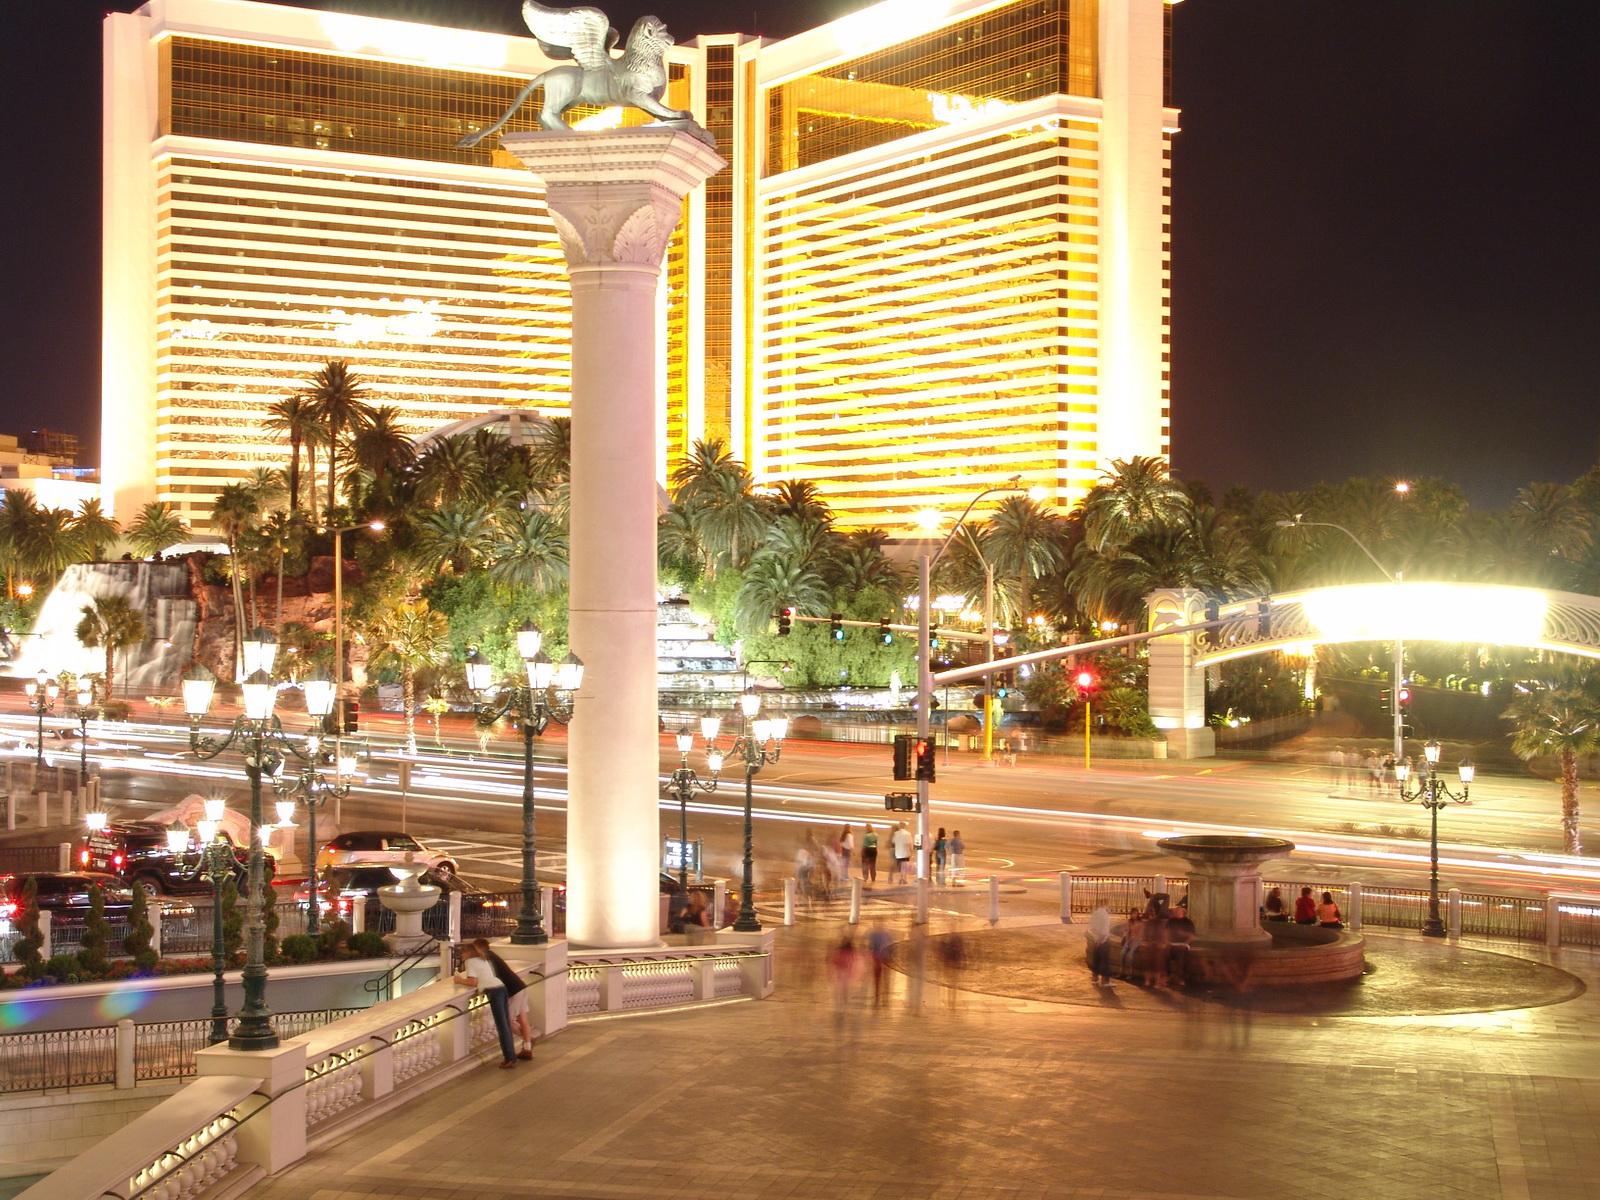 Las Vegas Wallpaper Hd Wide Screen Wallpapers 1080p 2k 4k